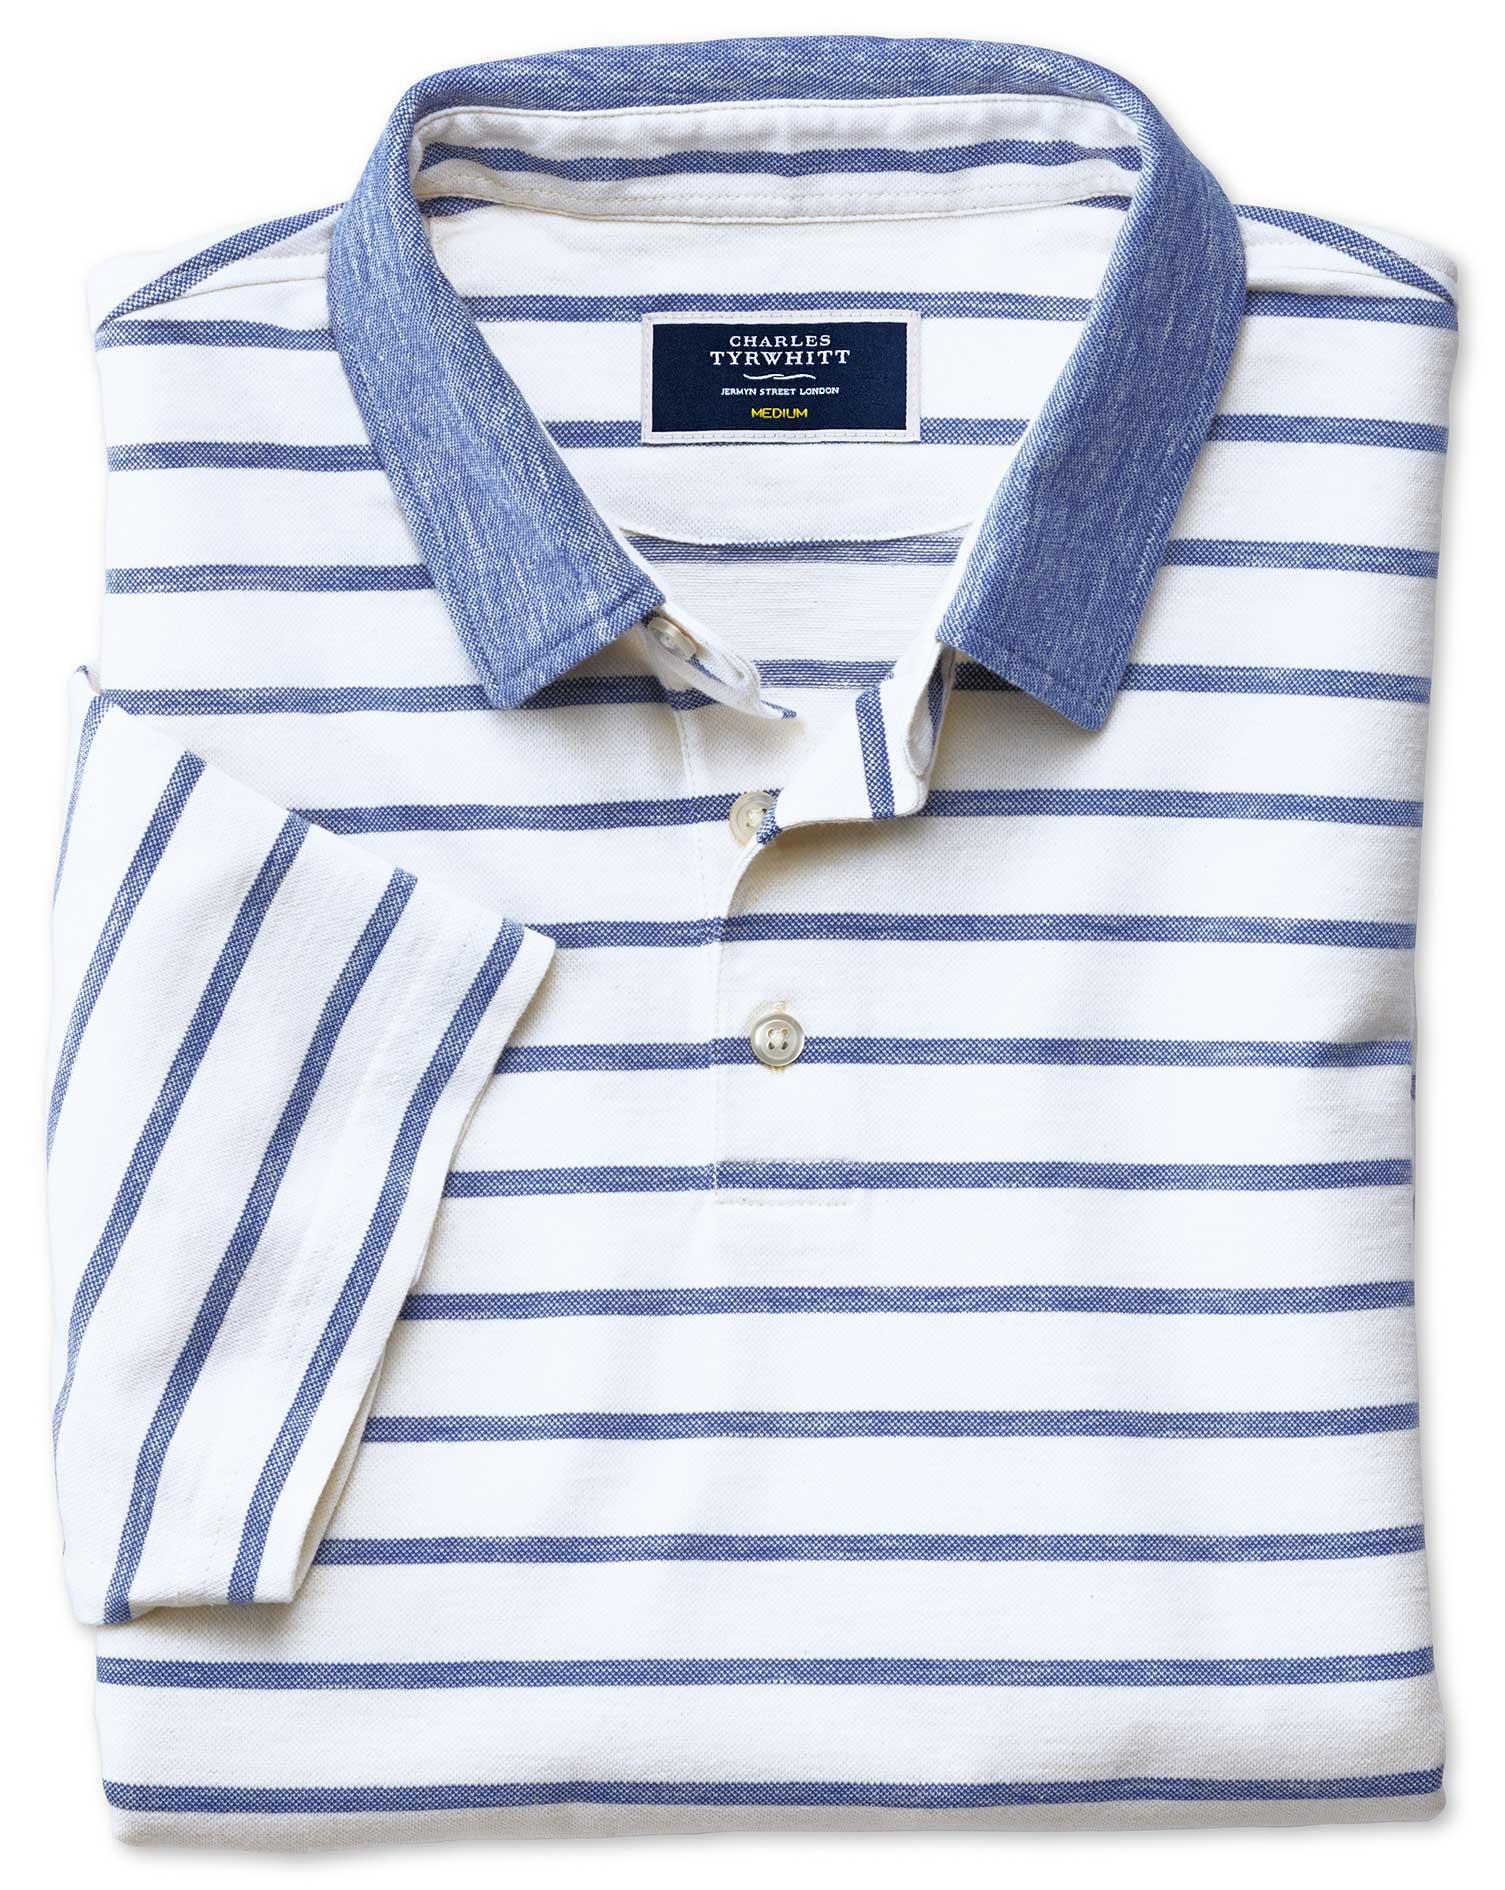 Navy and White Stripe Cotton Linen Polo Size XXL by Charles Tyrwhitt